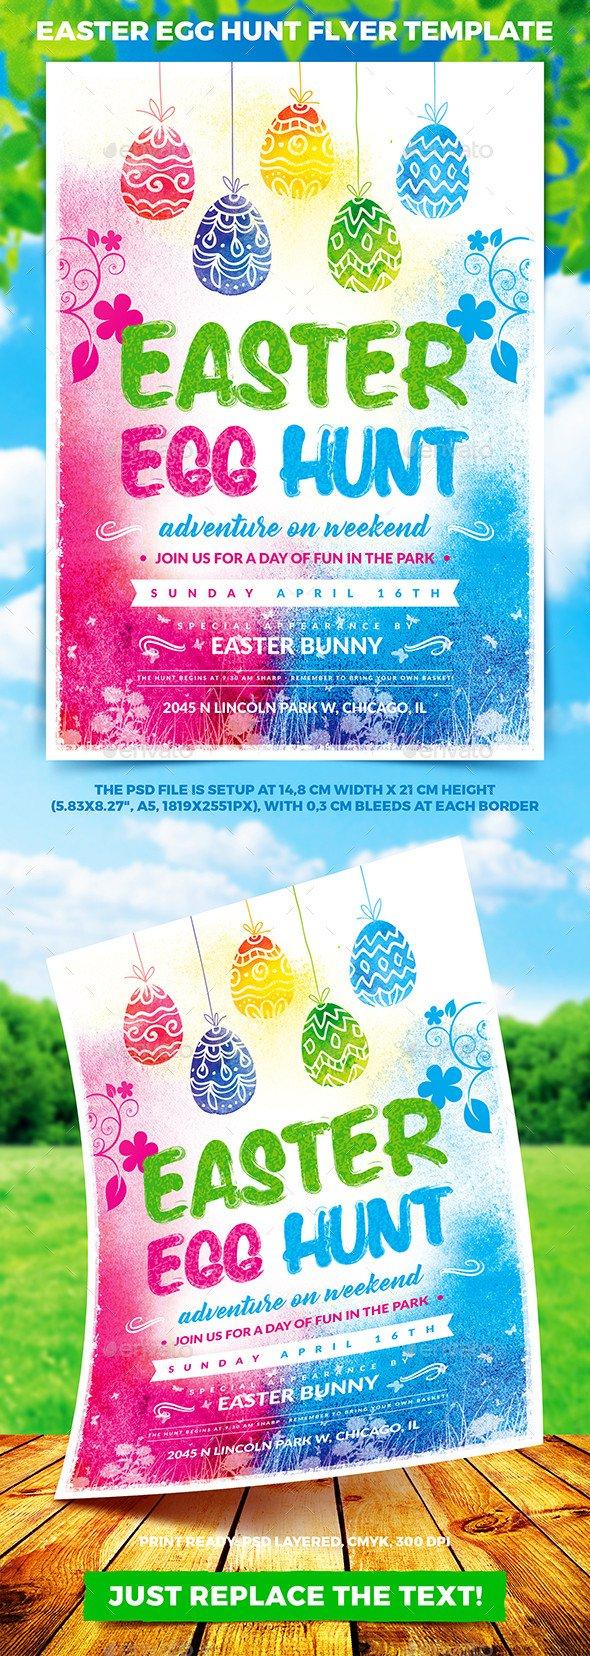 Easter Egg Hunt Flyer Easter Egg Hunt Flyer Template Vol 1 by 4ustudio